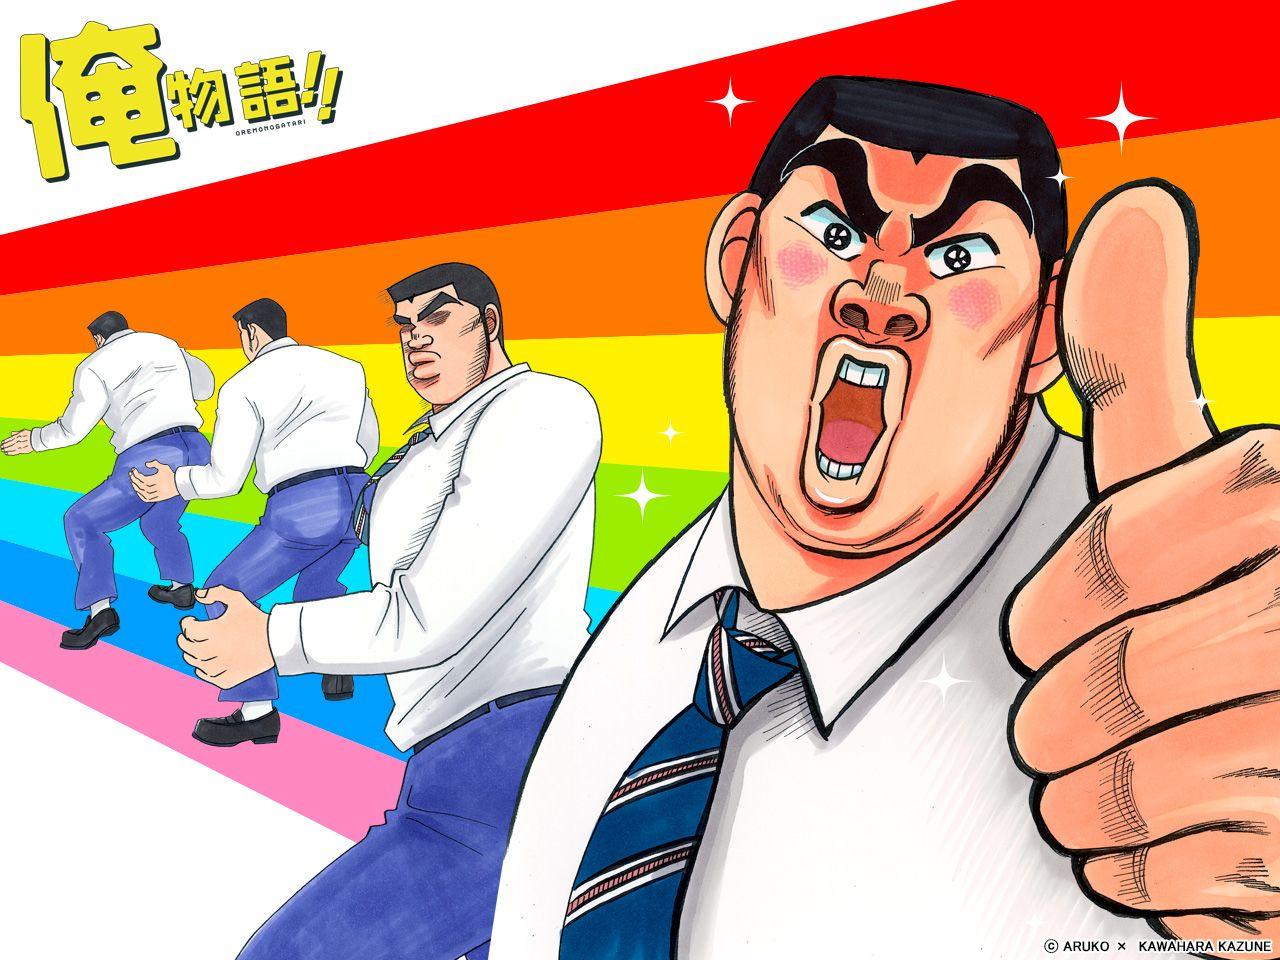 Ore Monogatari Wallpaper Hd Takeo By Corphish2 On Deviantart Anime